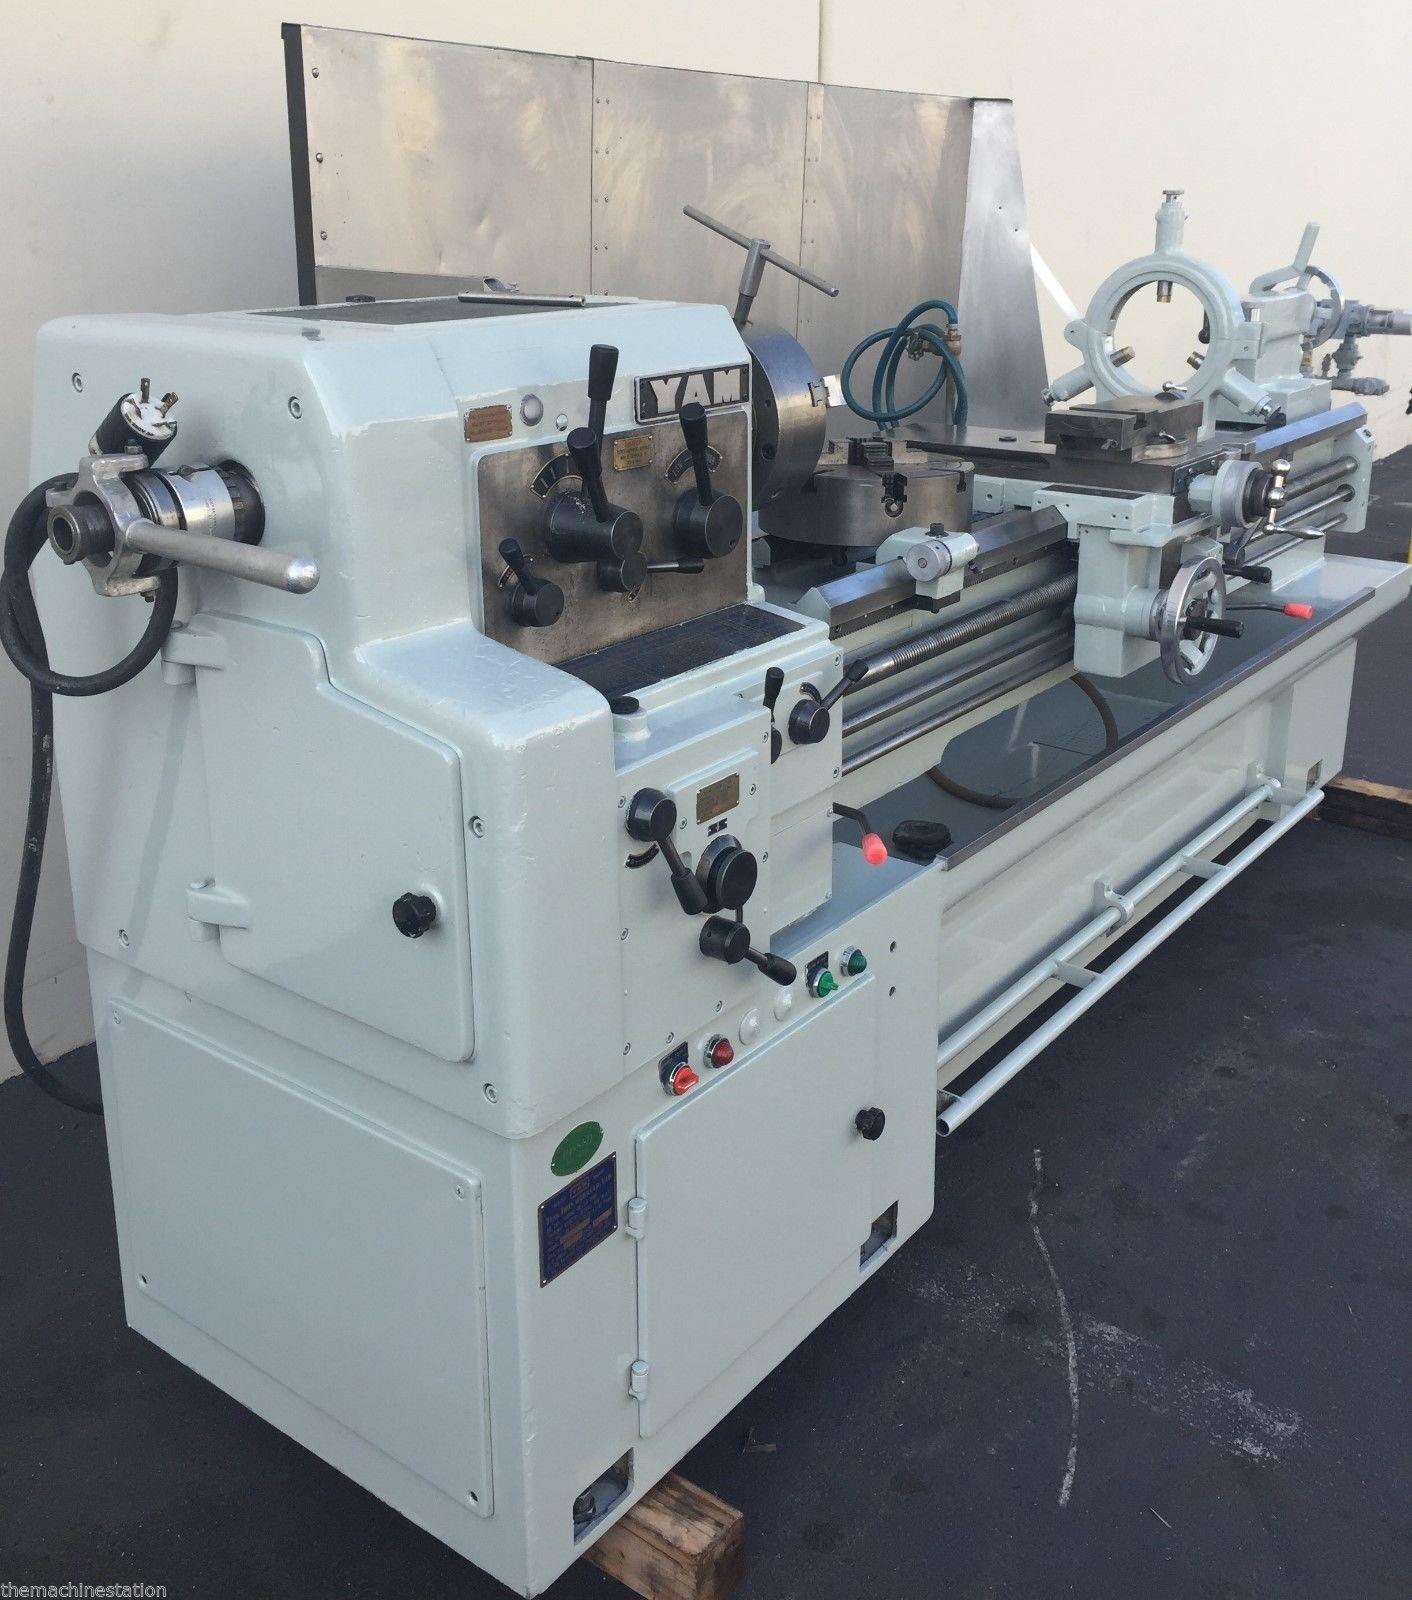 Yam 1500g Geared Head Engine Lathe Machinestation